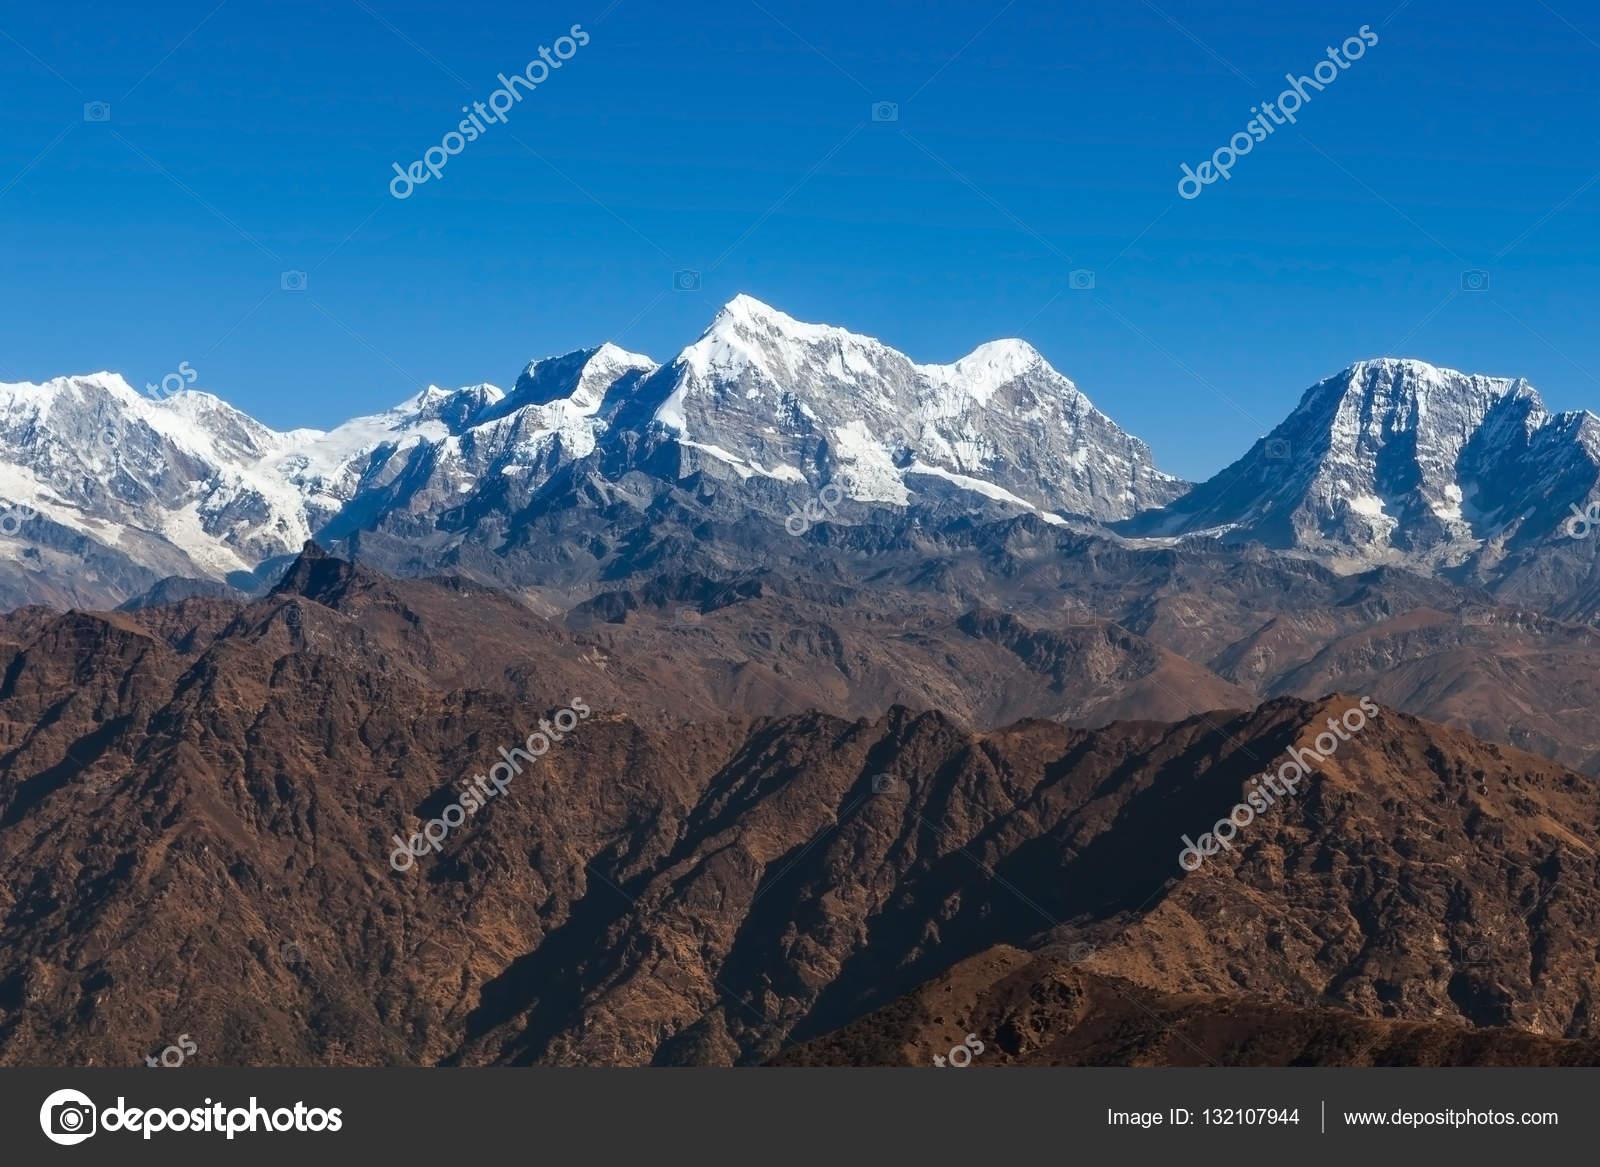 amazing mountain landscape with